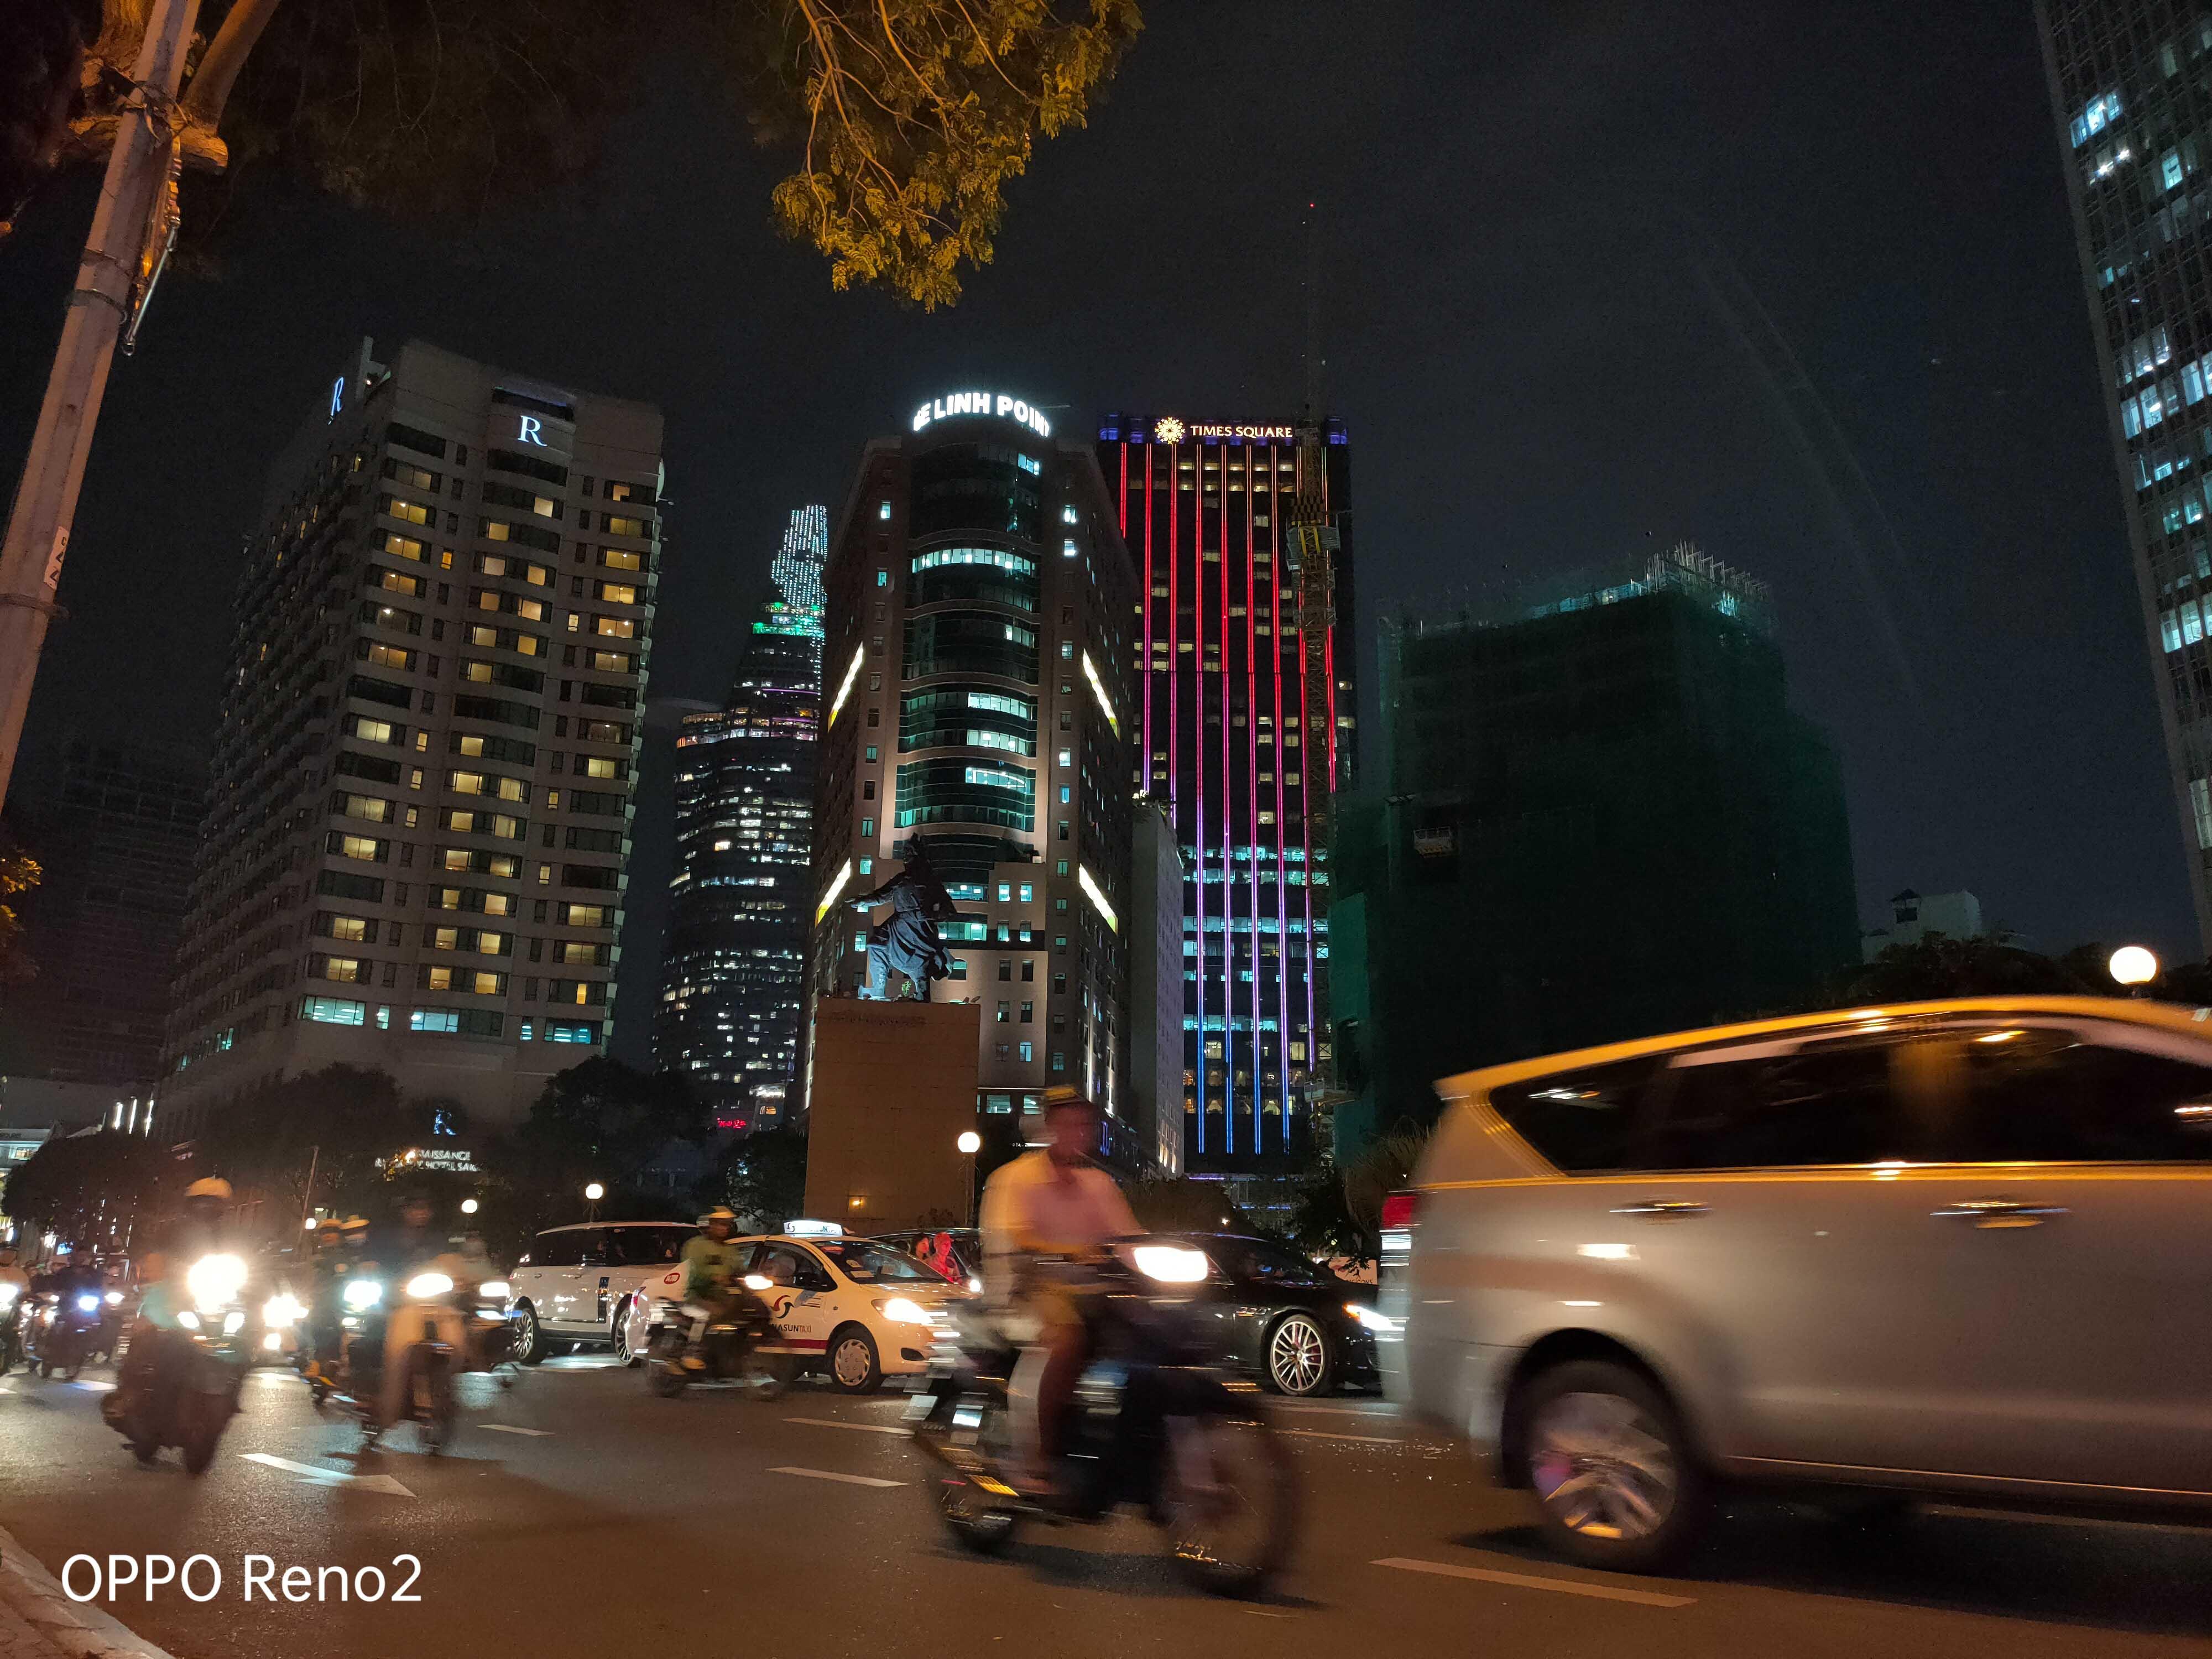 oppo reno2 v Dzung Yoko - PR4 - elle vietnam 16